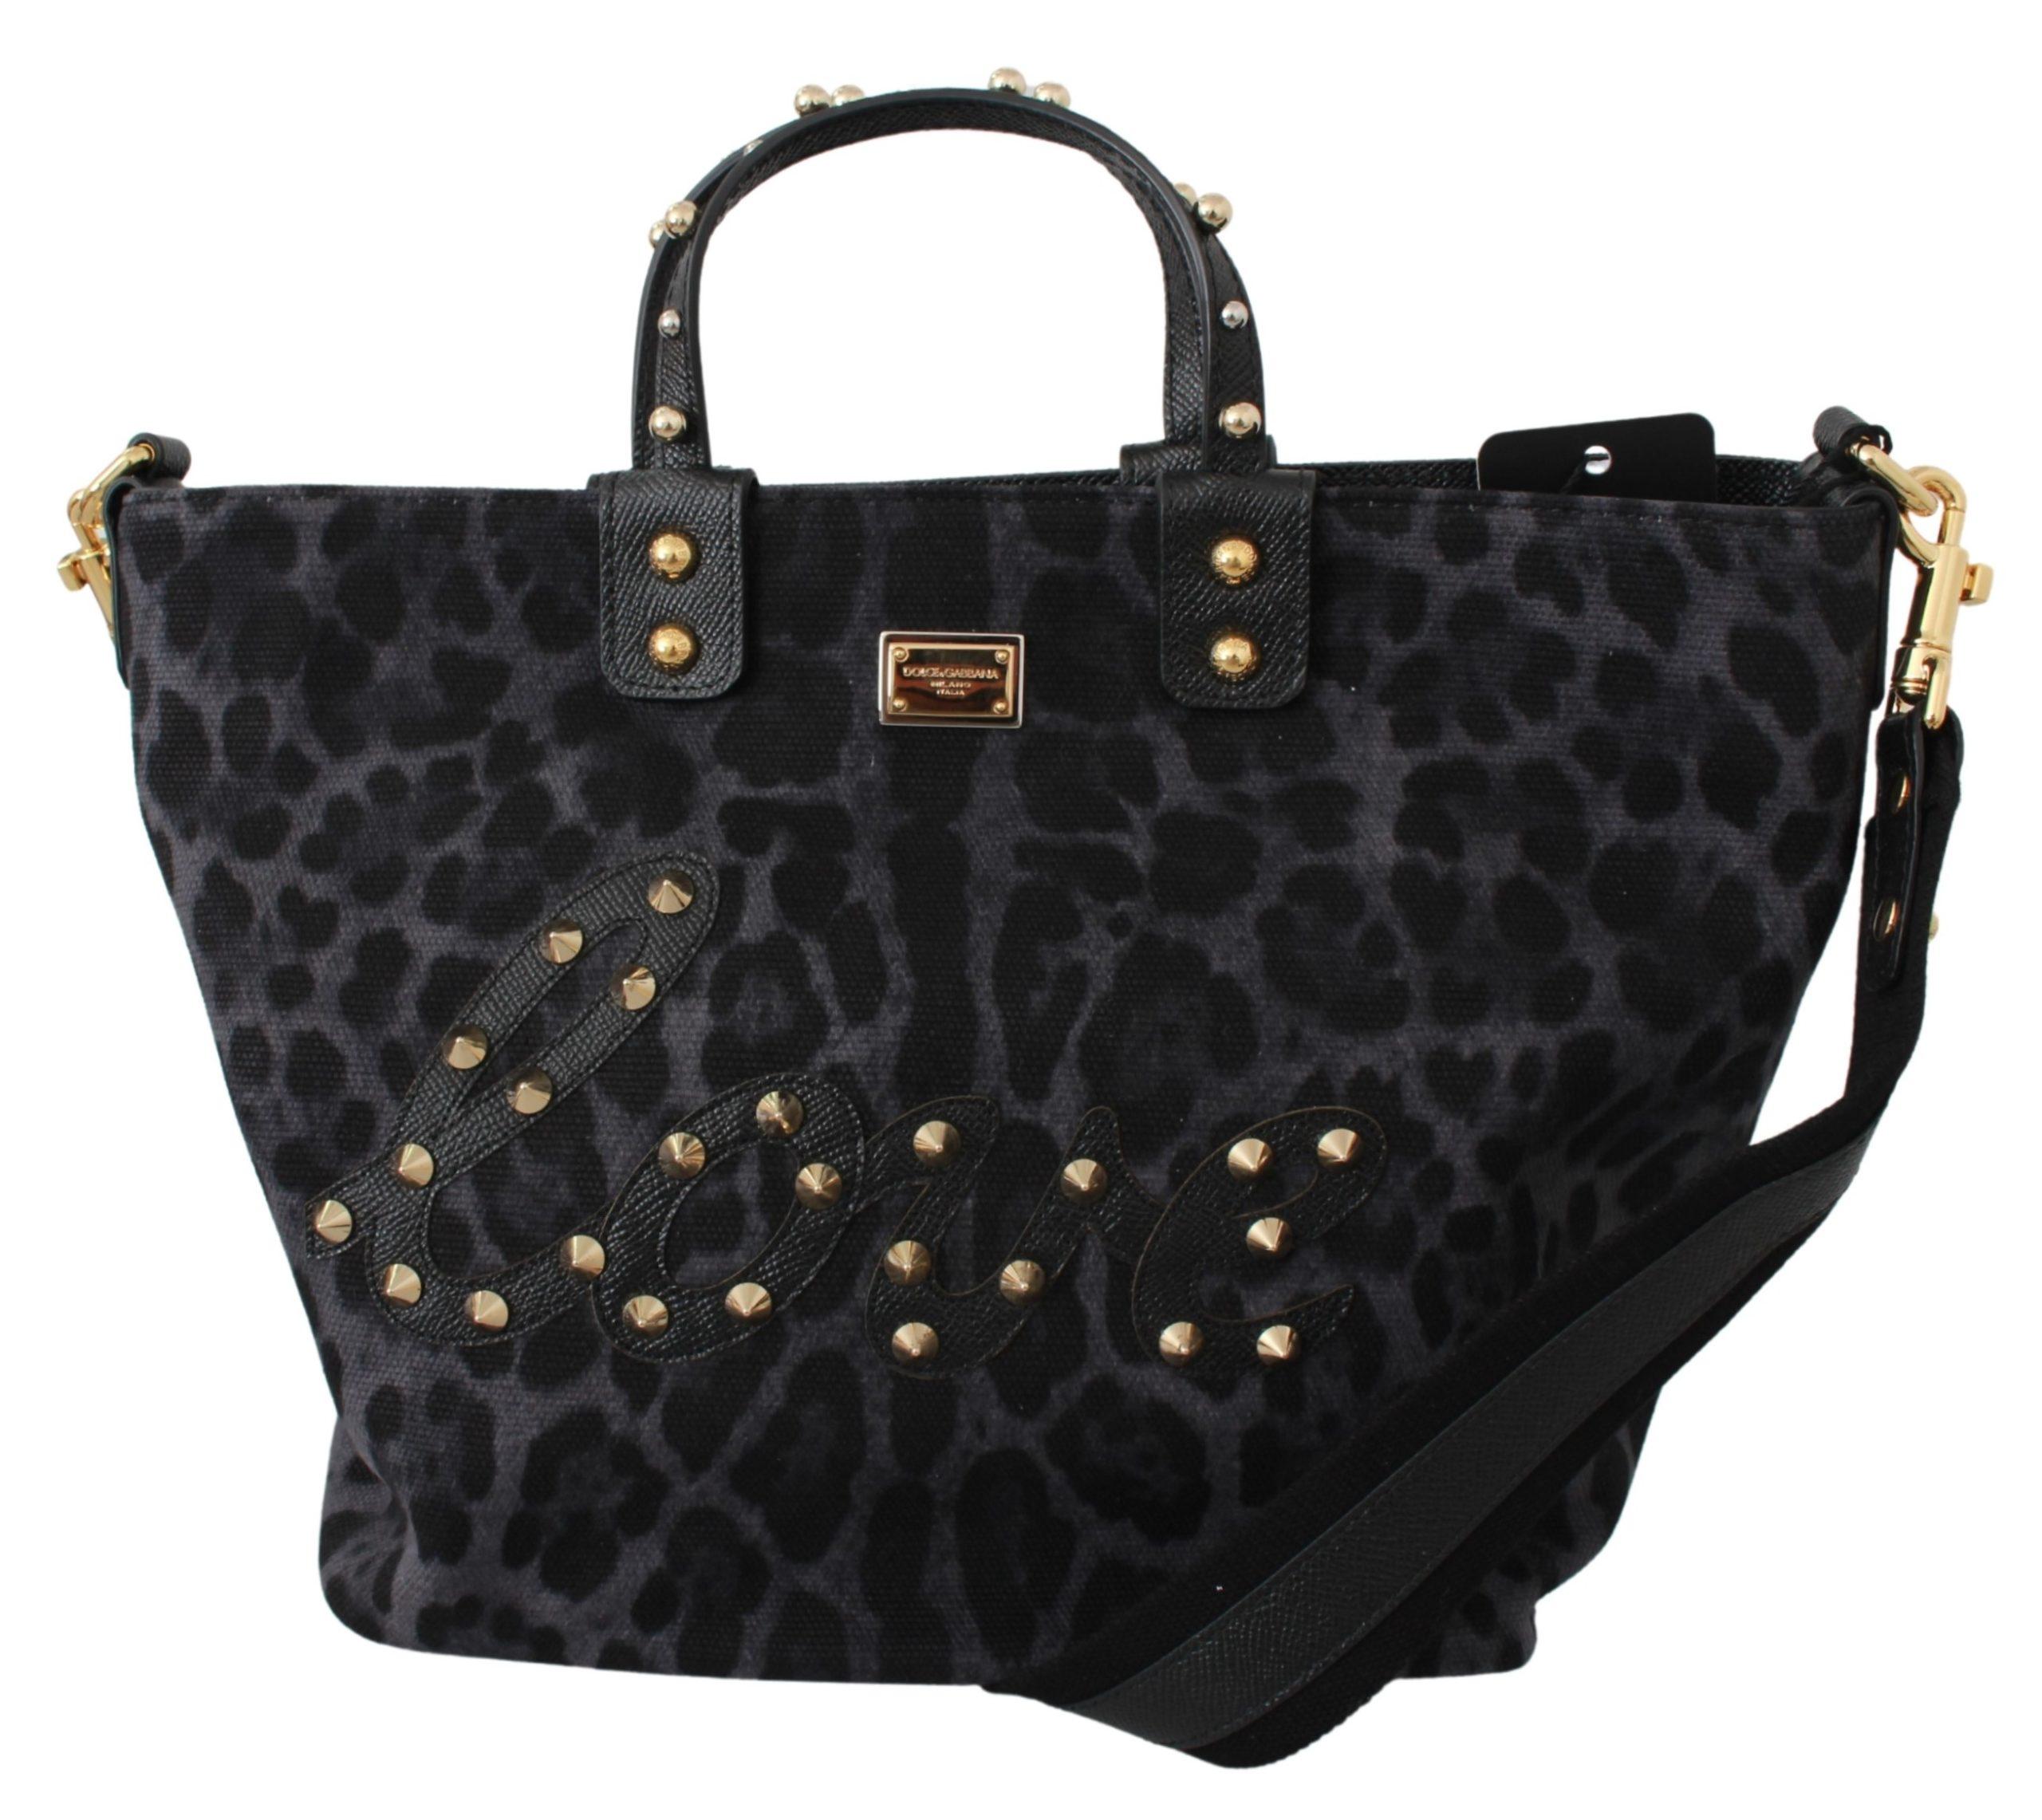 Dolce & Gabbana Women's Leopard Love Patch Studs Tote Bag Blue VAS9433